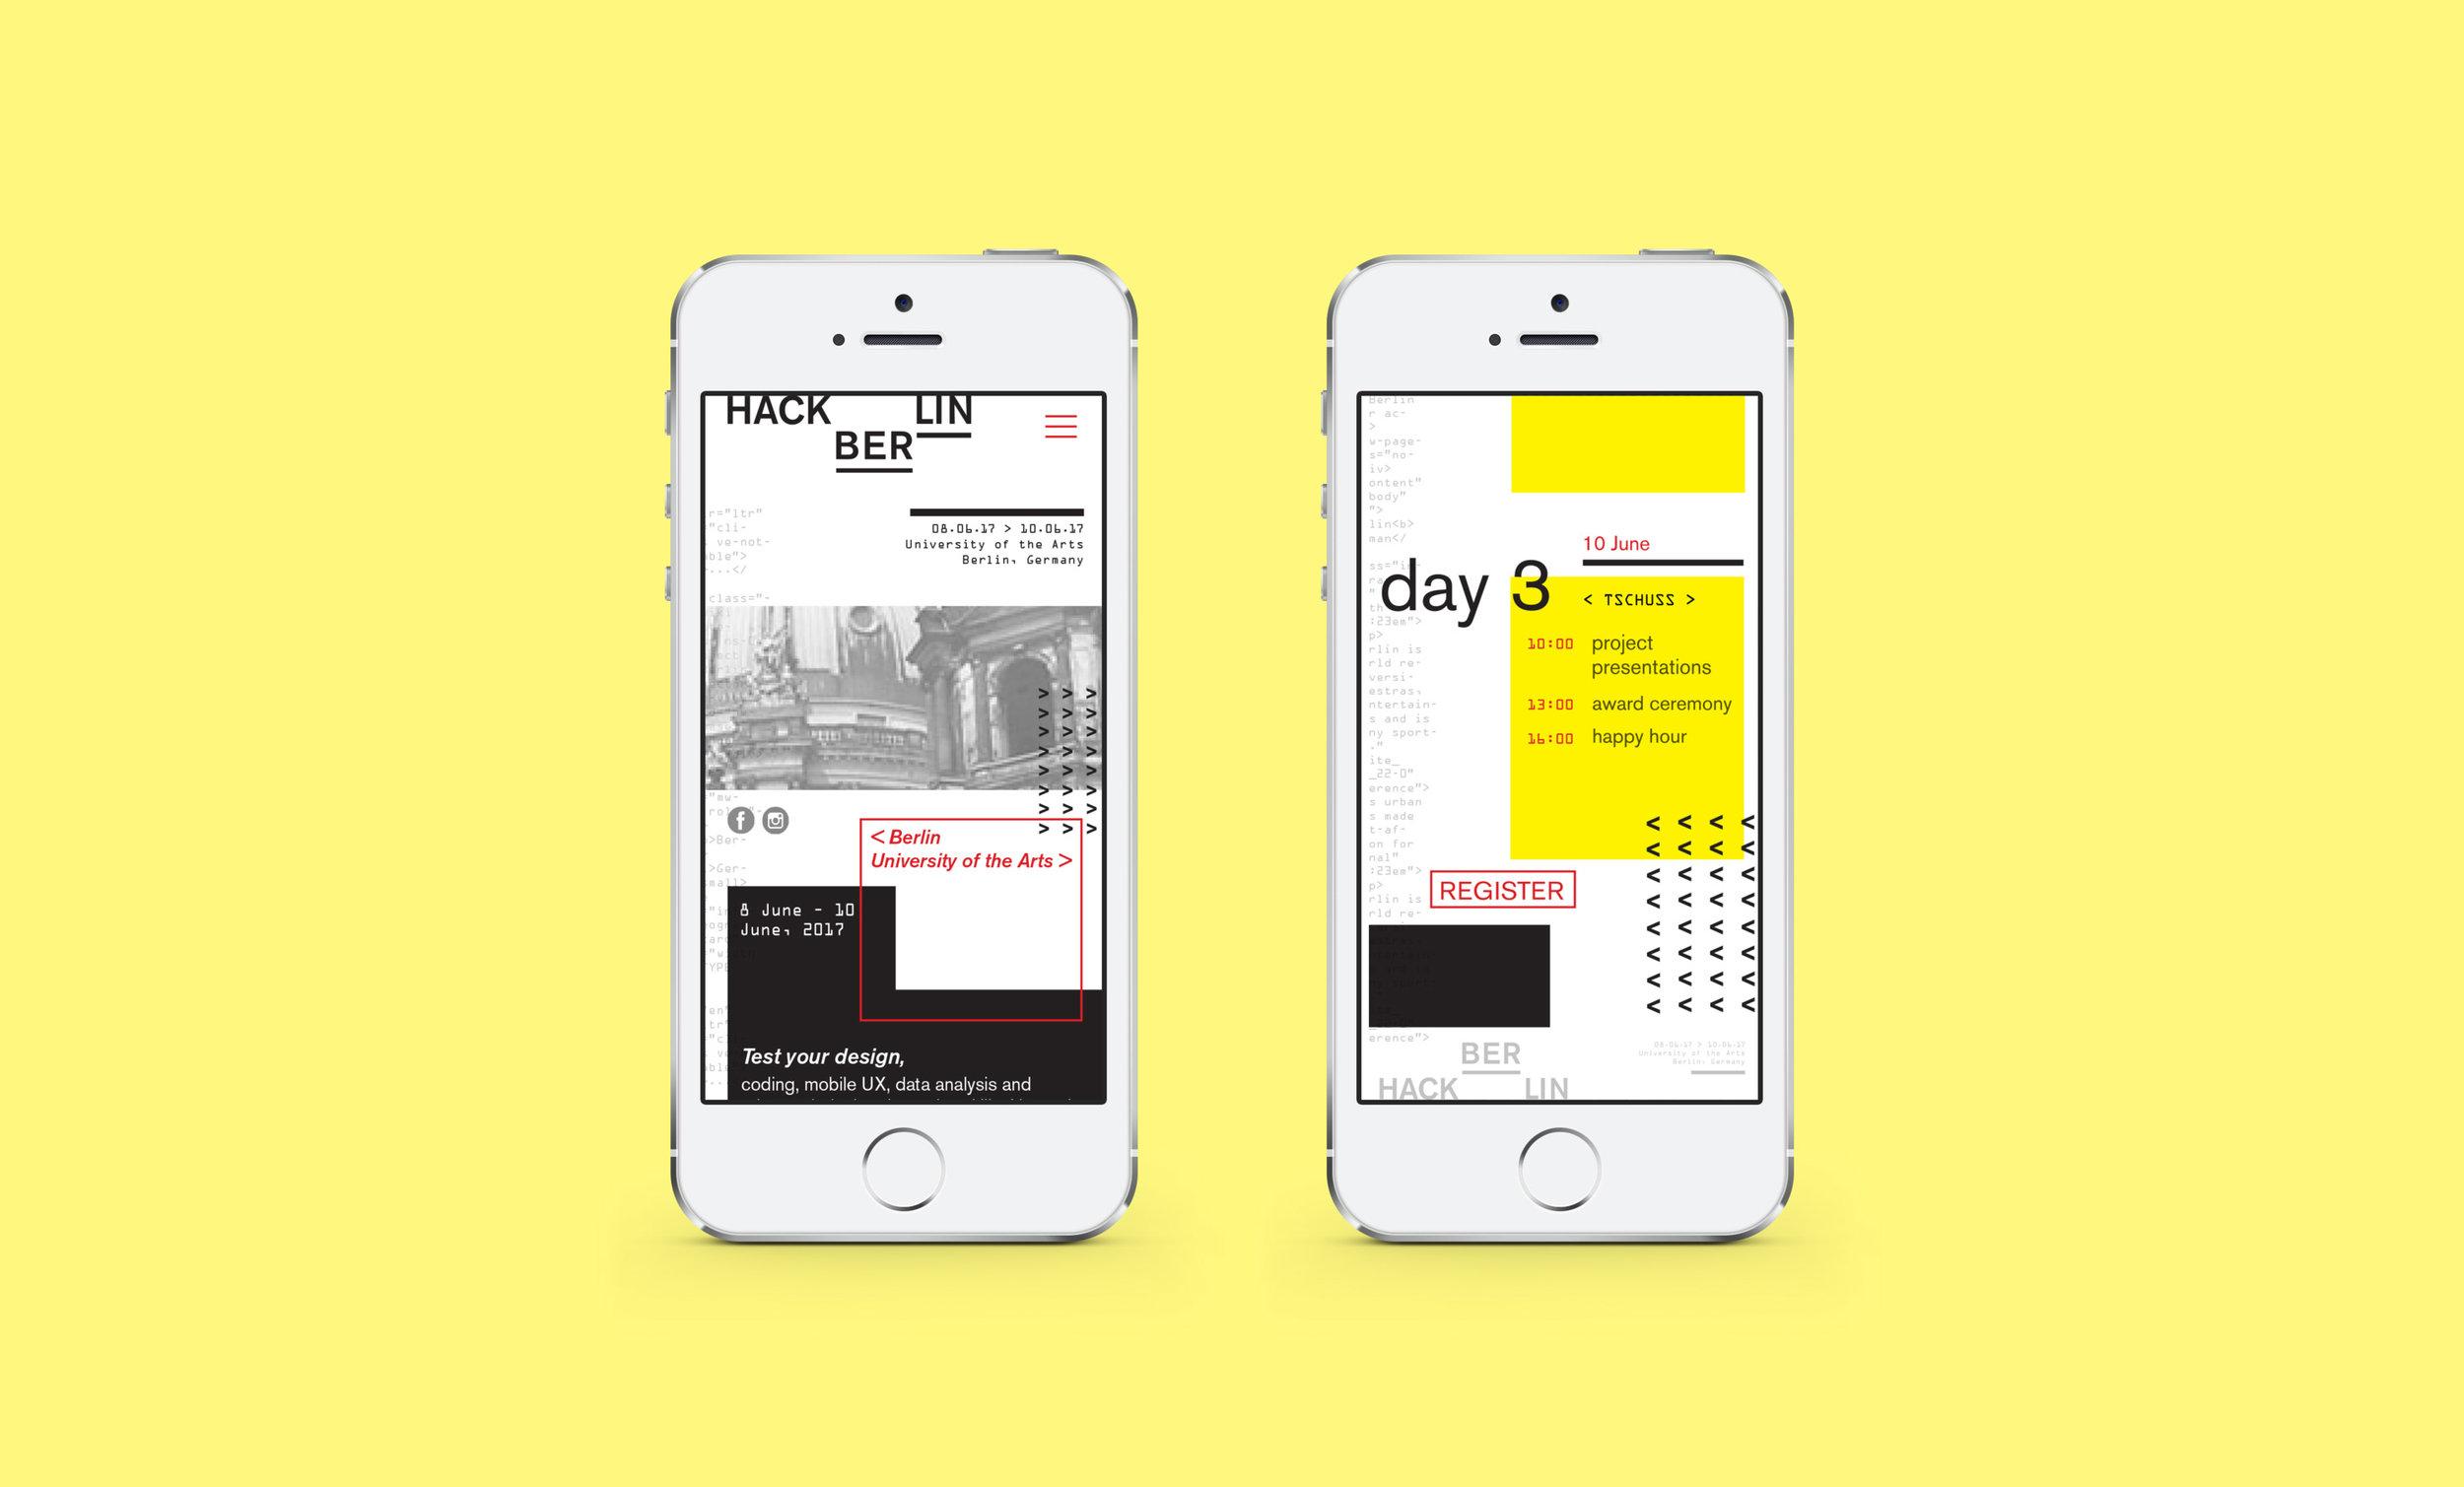 hack+iphone+mockup2 cover.jpg